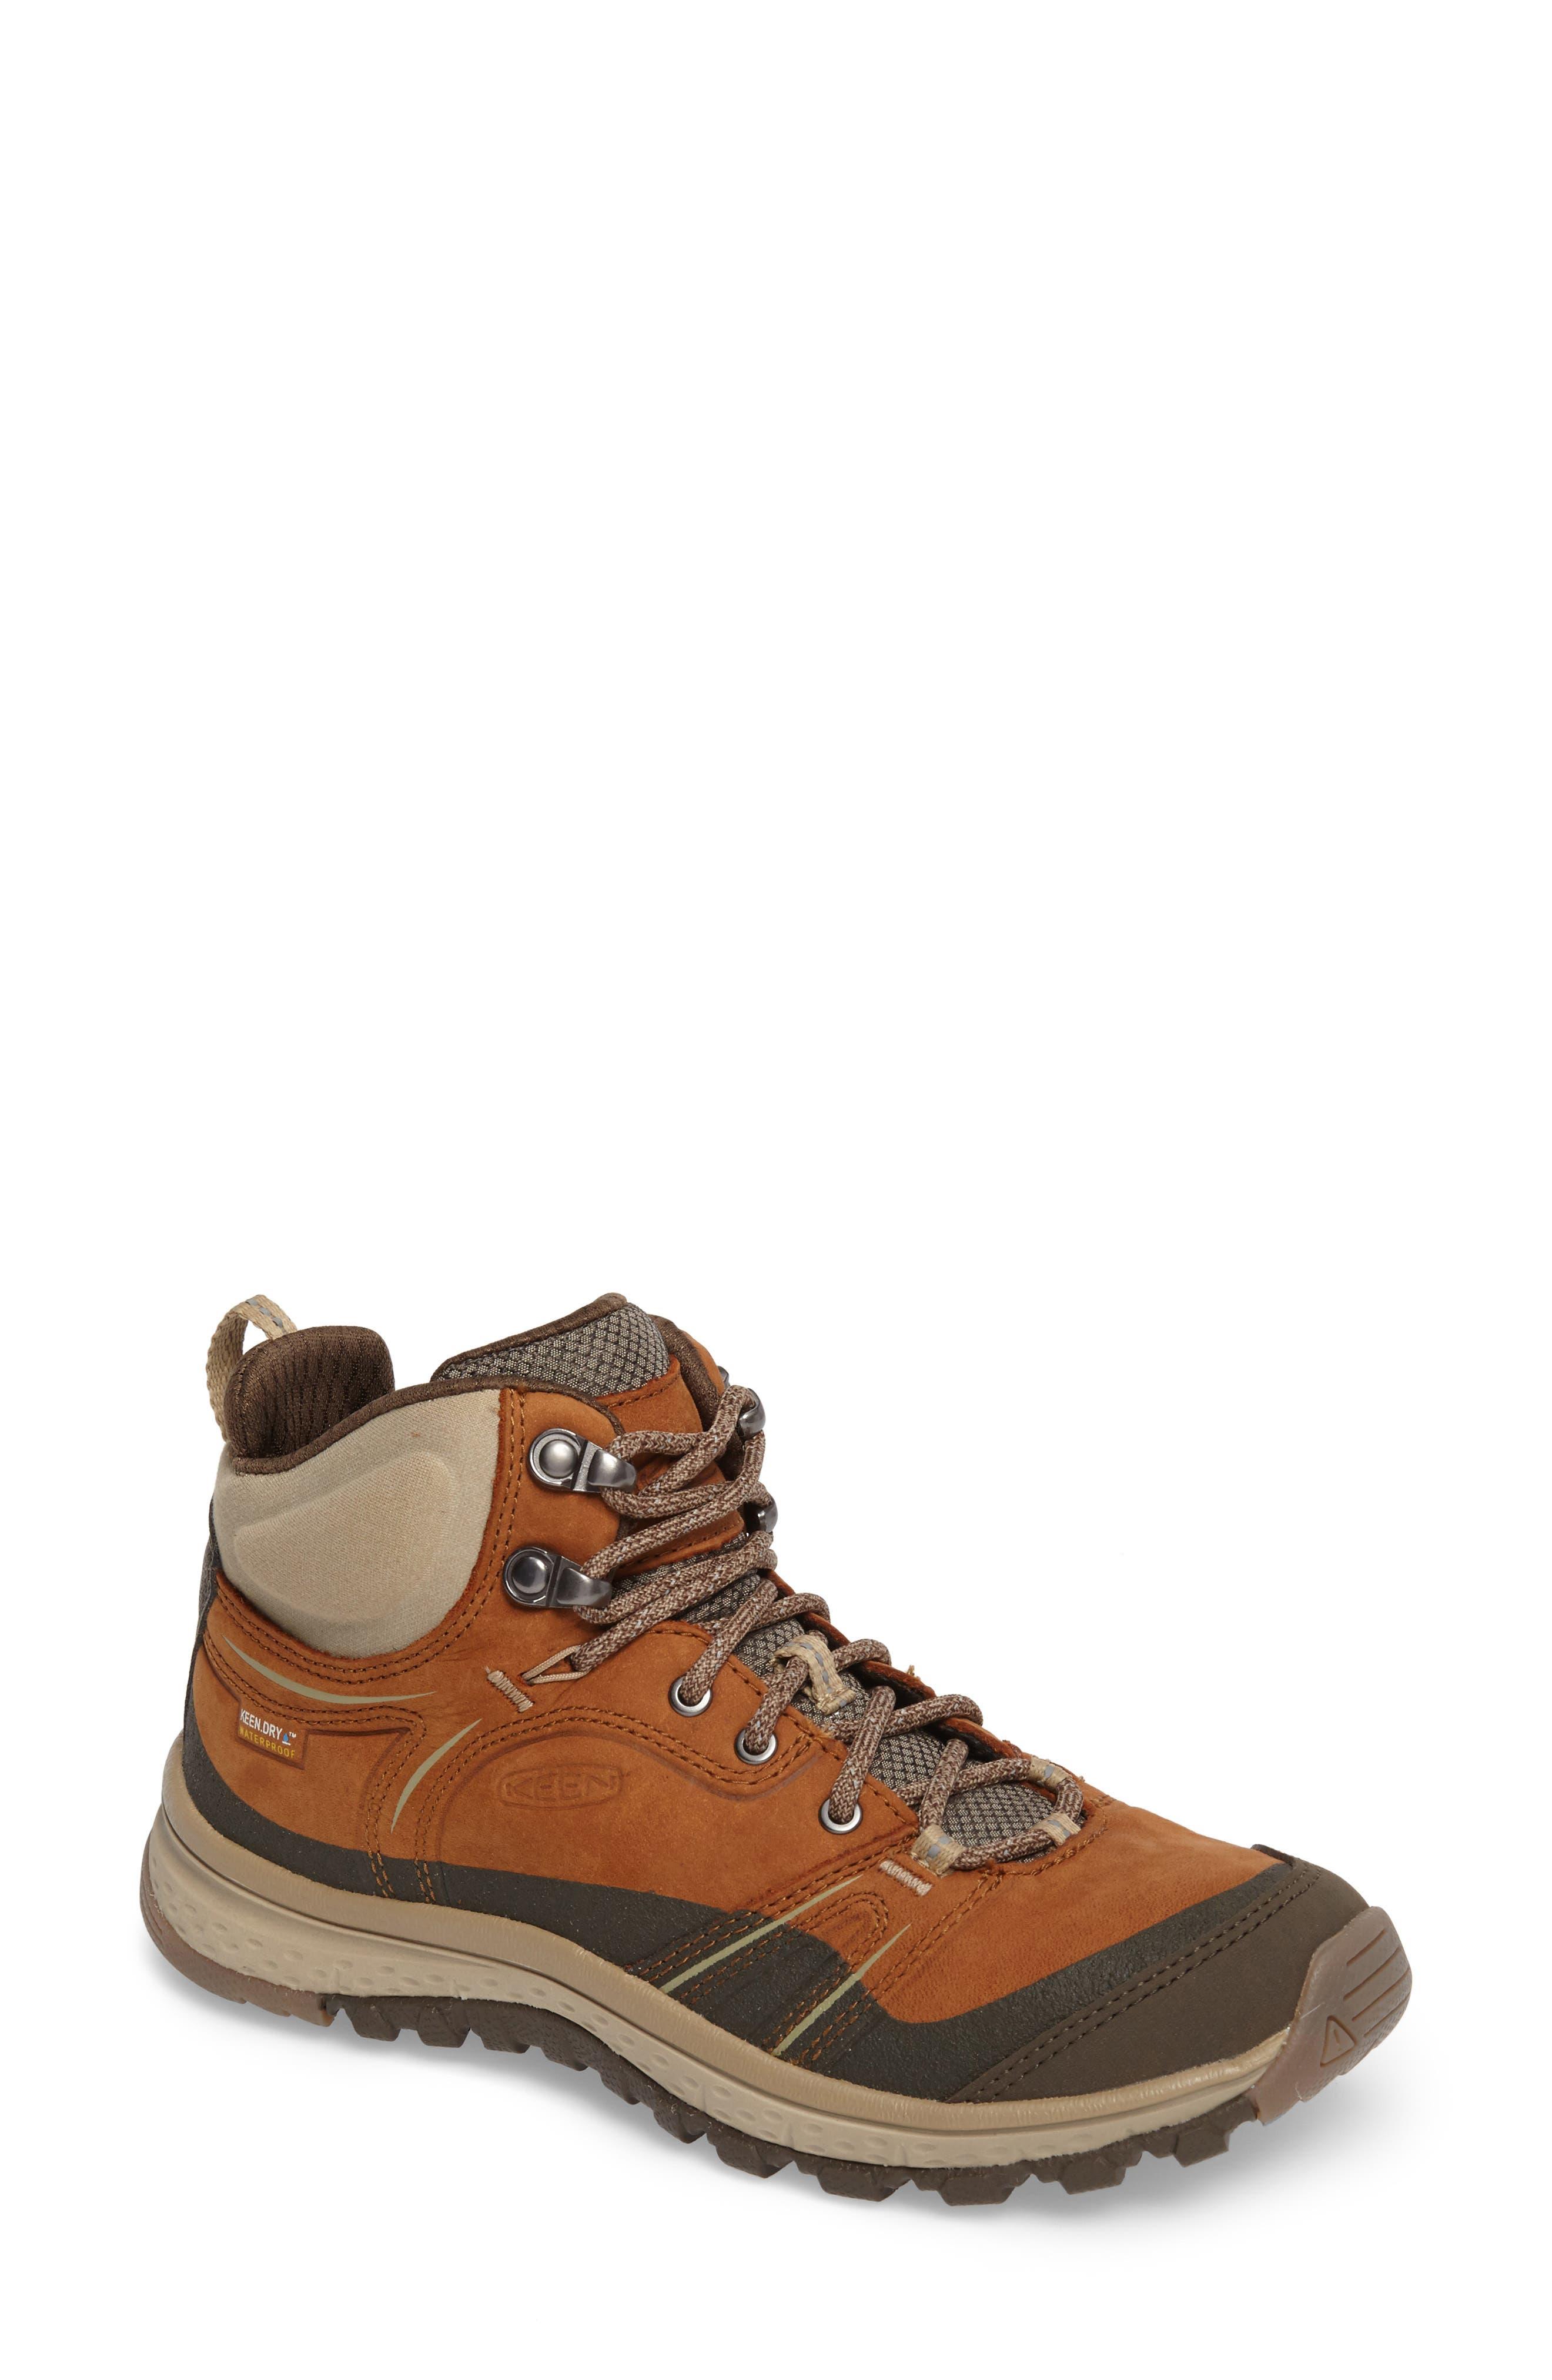 KEEN, Terradora Leather Waterproof Hiking Boot, Main thumbnail 1, color, TIMBER/ ORANGE NUBUCK